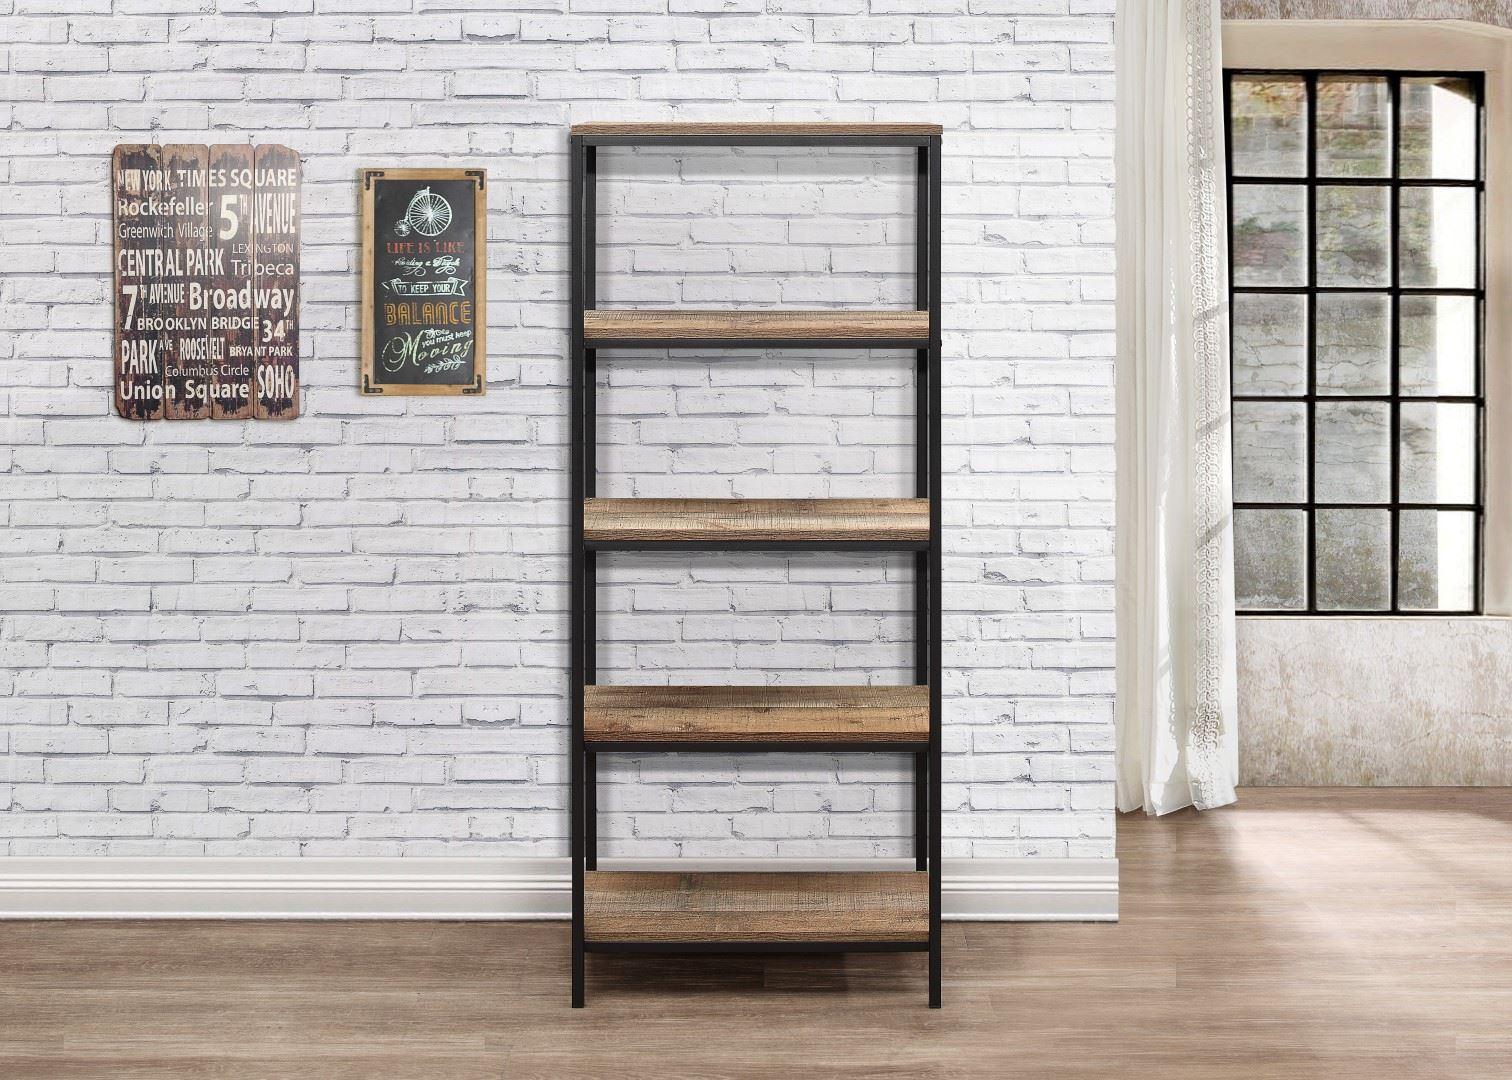 Birlea Urban Industrial Chic 5 Tier Shelving Unit Bookcase